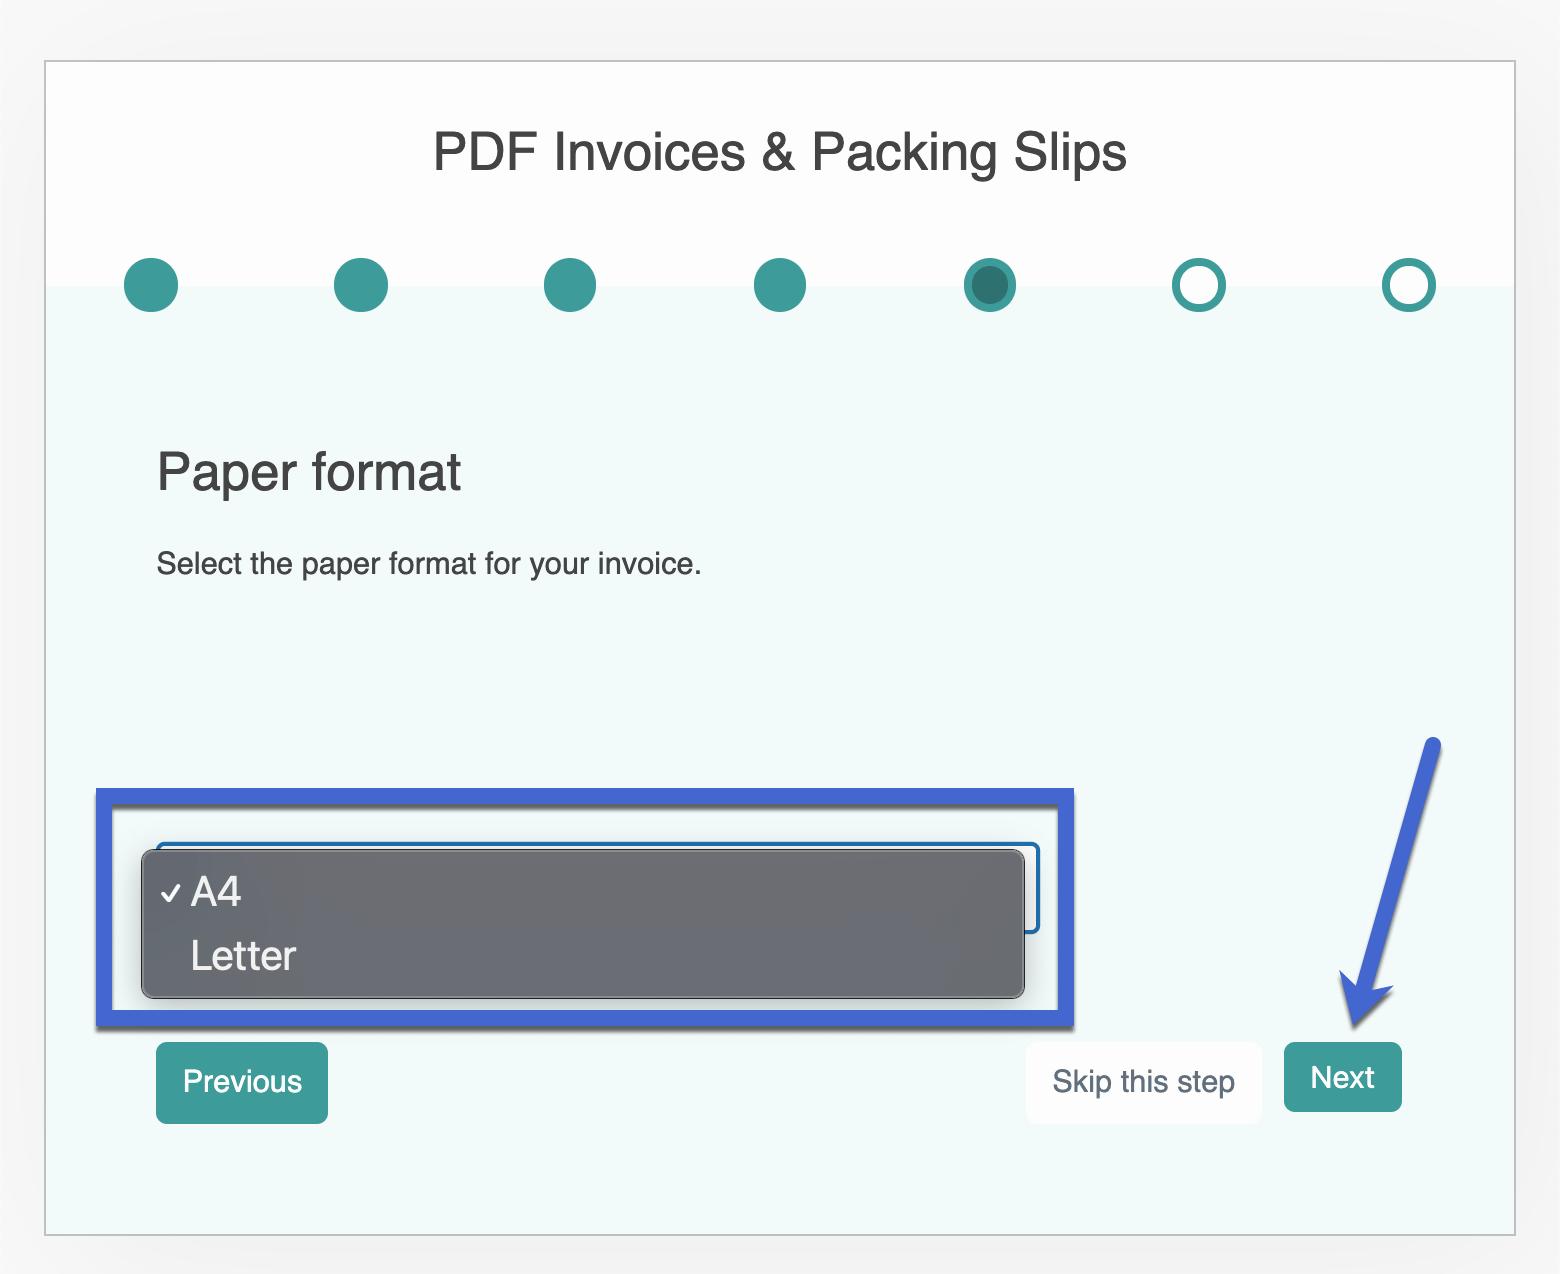 formato de papel para la factura de WooCommerce